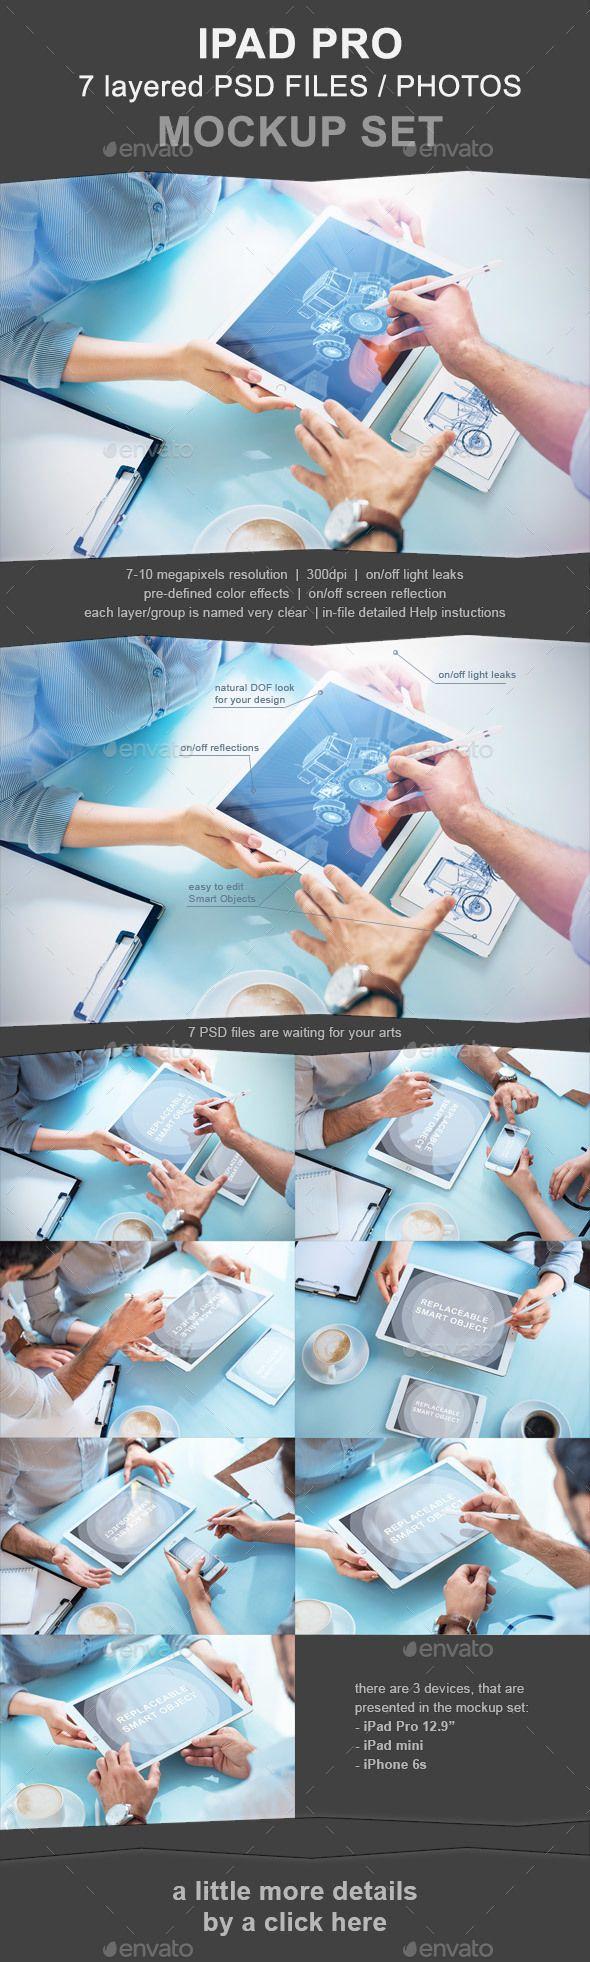 iPad Pro #Photo #Mockup Set - 7 PSD - Mobile Displays Download here: https://graphicriver.net/item/ipad-pro-photo-mockup-set-7-psd/19692975?ref=alena994